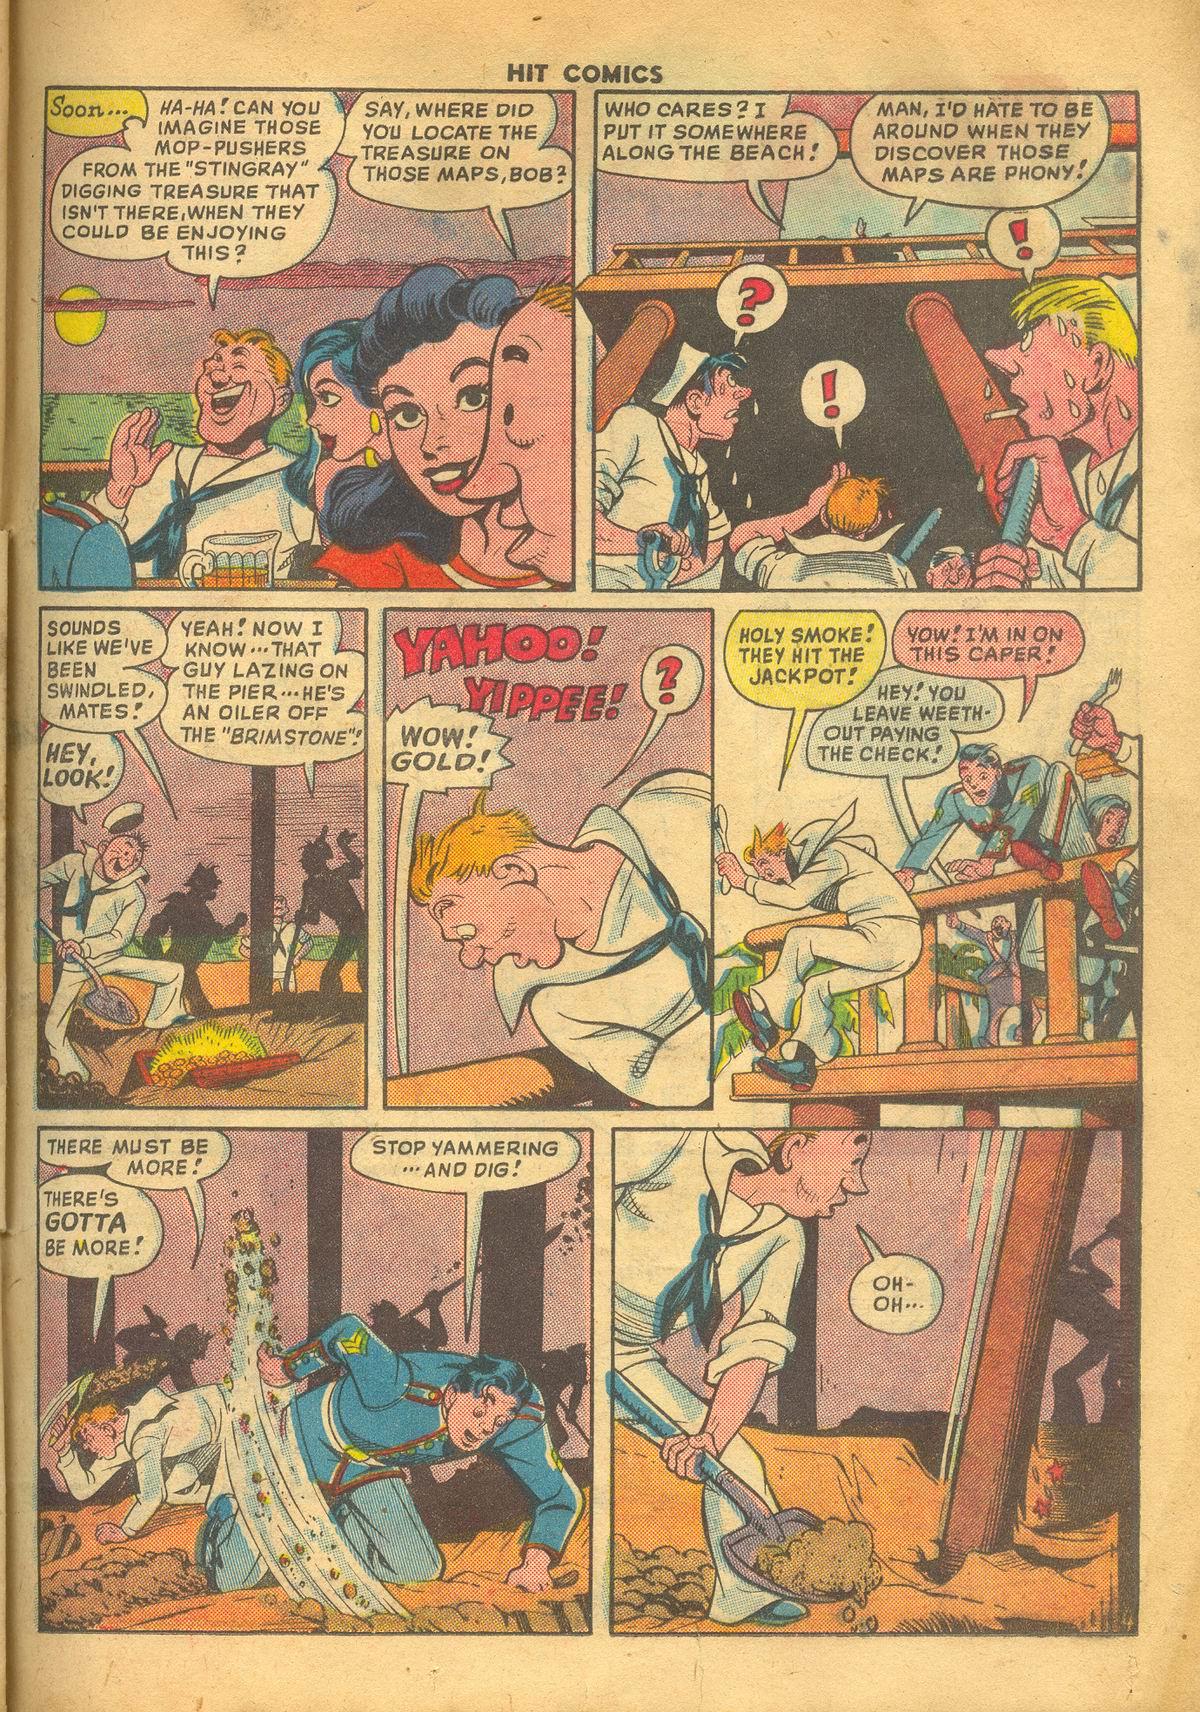 Read online Hit Comics comic -  Issue #60 - 25